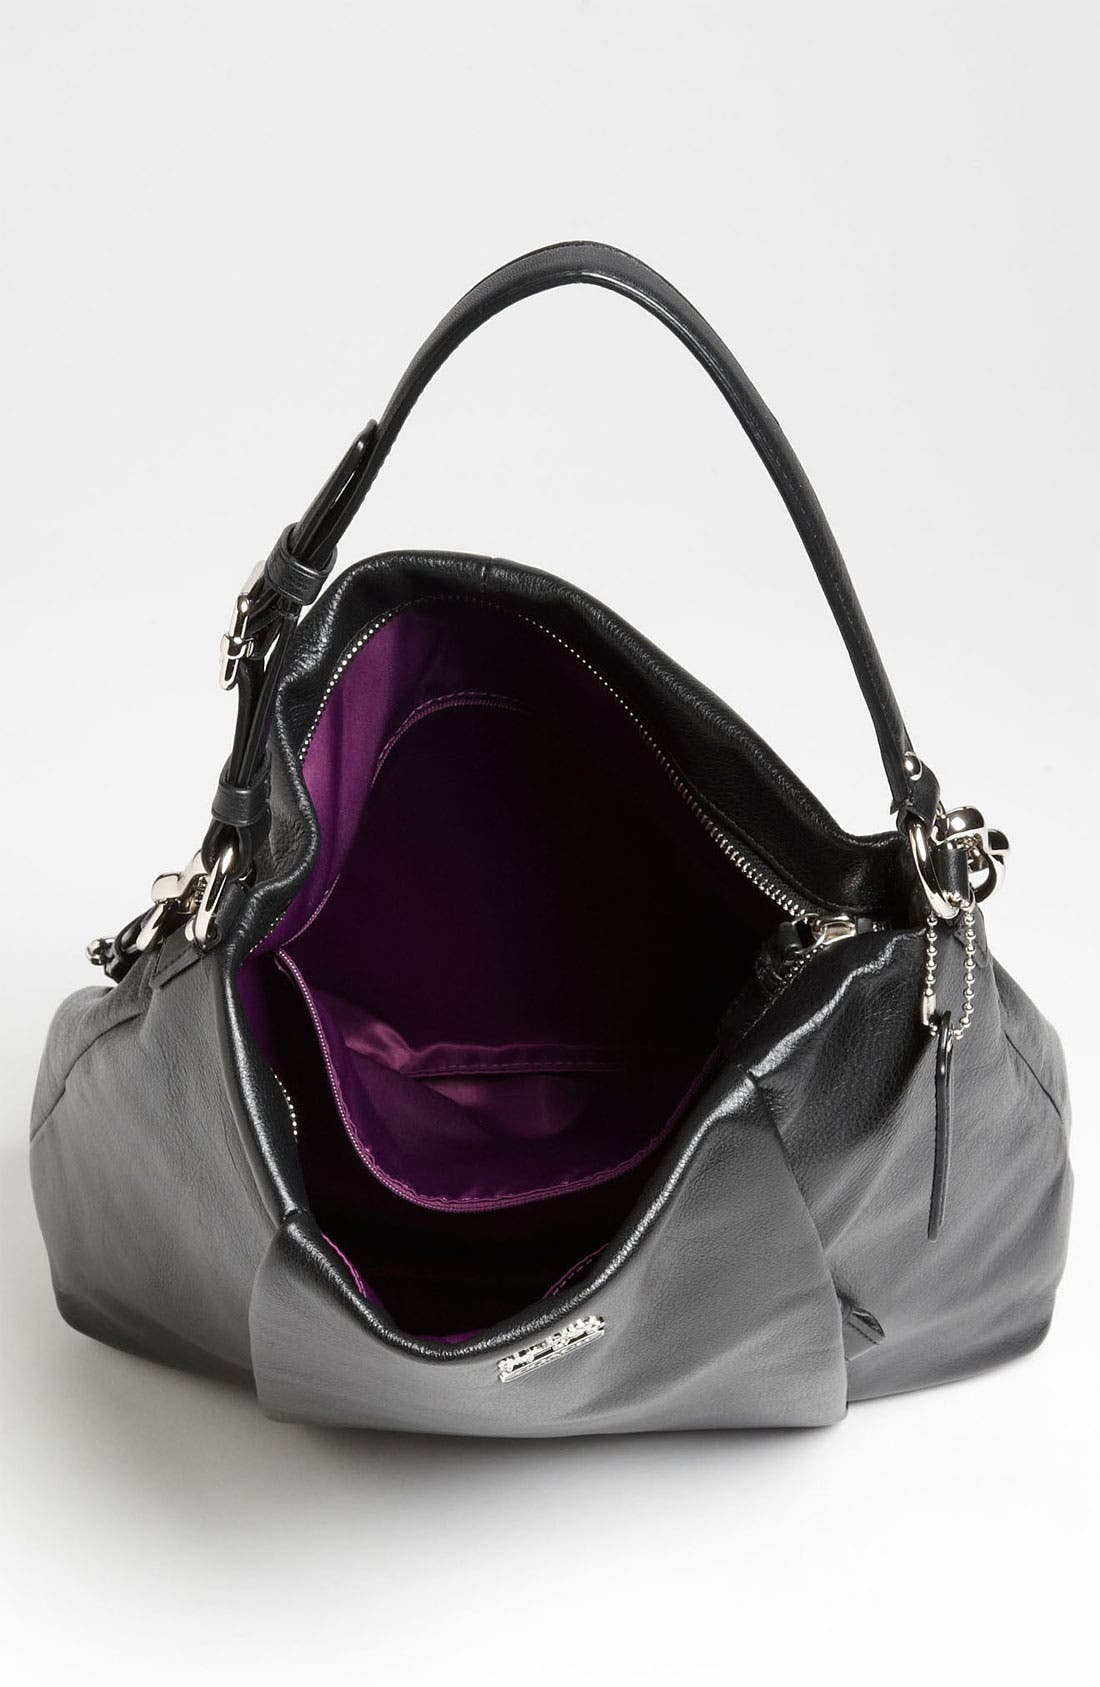 COACH,                             'New Madison - Isabelle' Leather Shoulder Bag,                             Alternate thumbnail 4, color,                             001